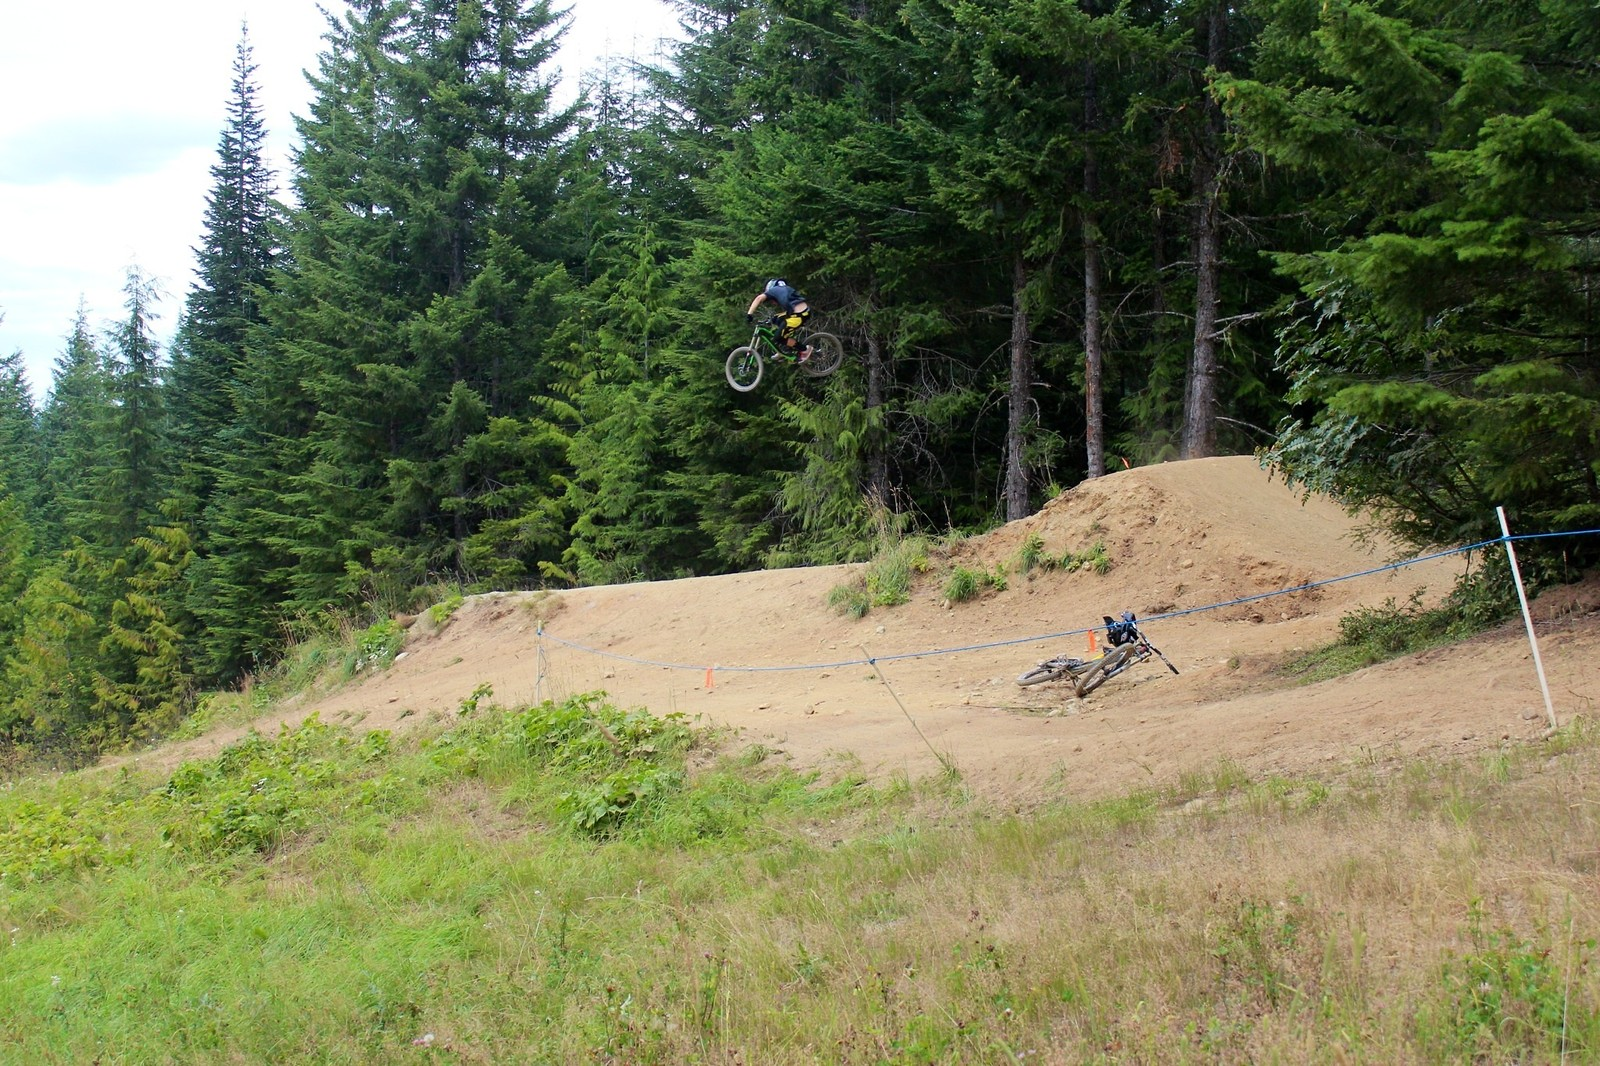 Sending Crabapple - Scharney127 - Mountain Biking Pictures - Vital MTB